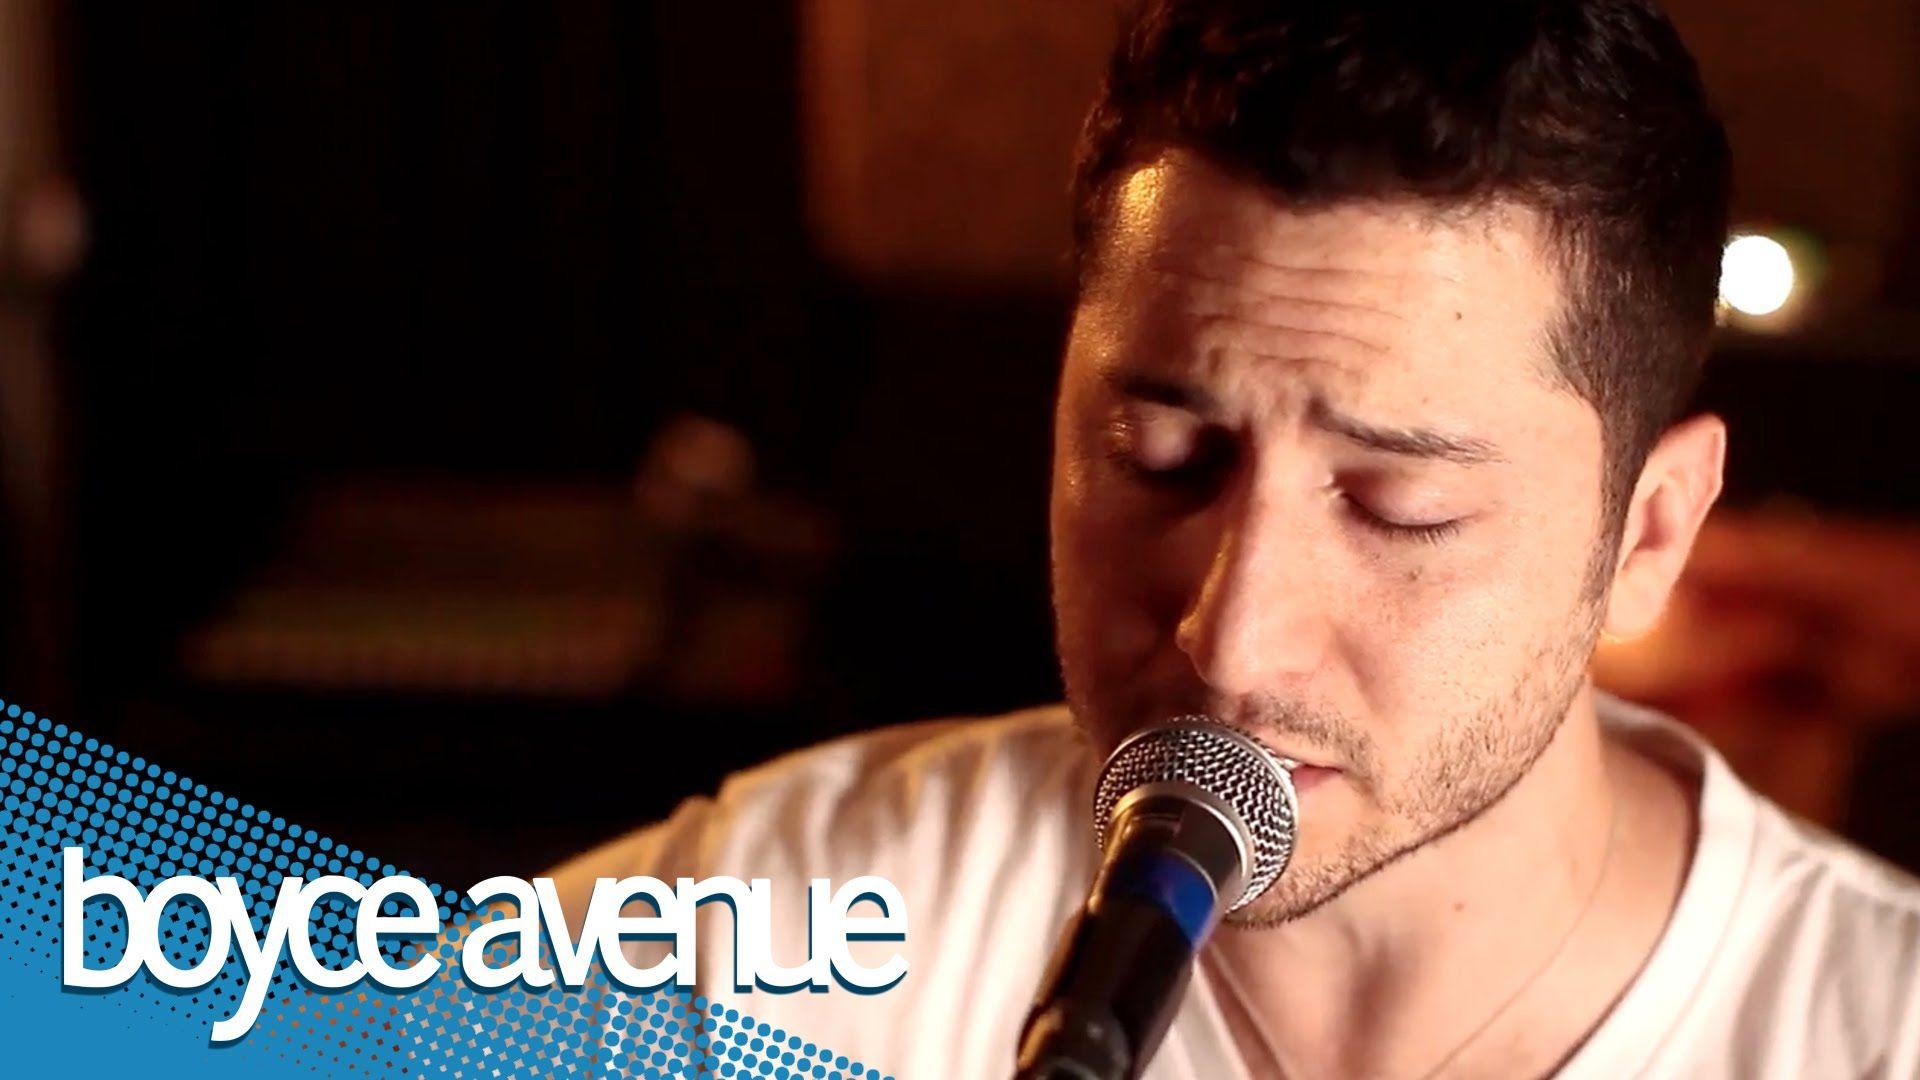 A Thousand Years - Christina Perri (Boyce Avenue acoustic cover) on ...